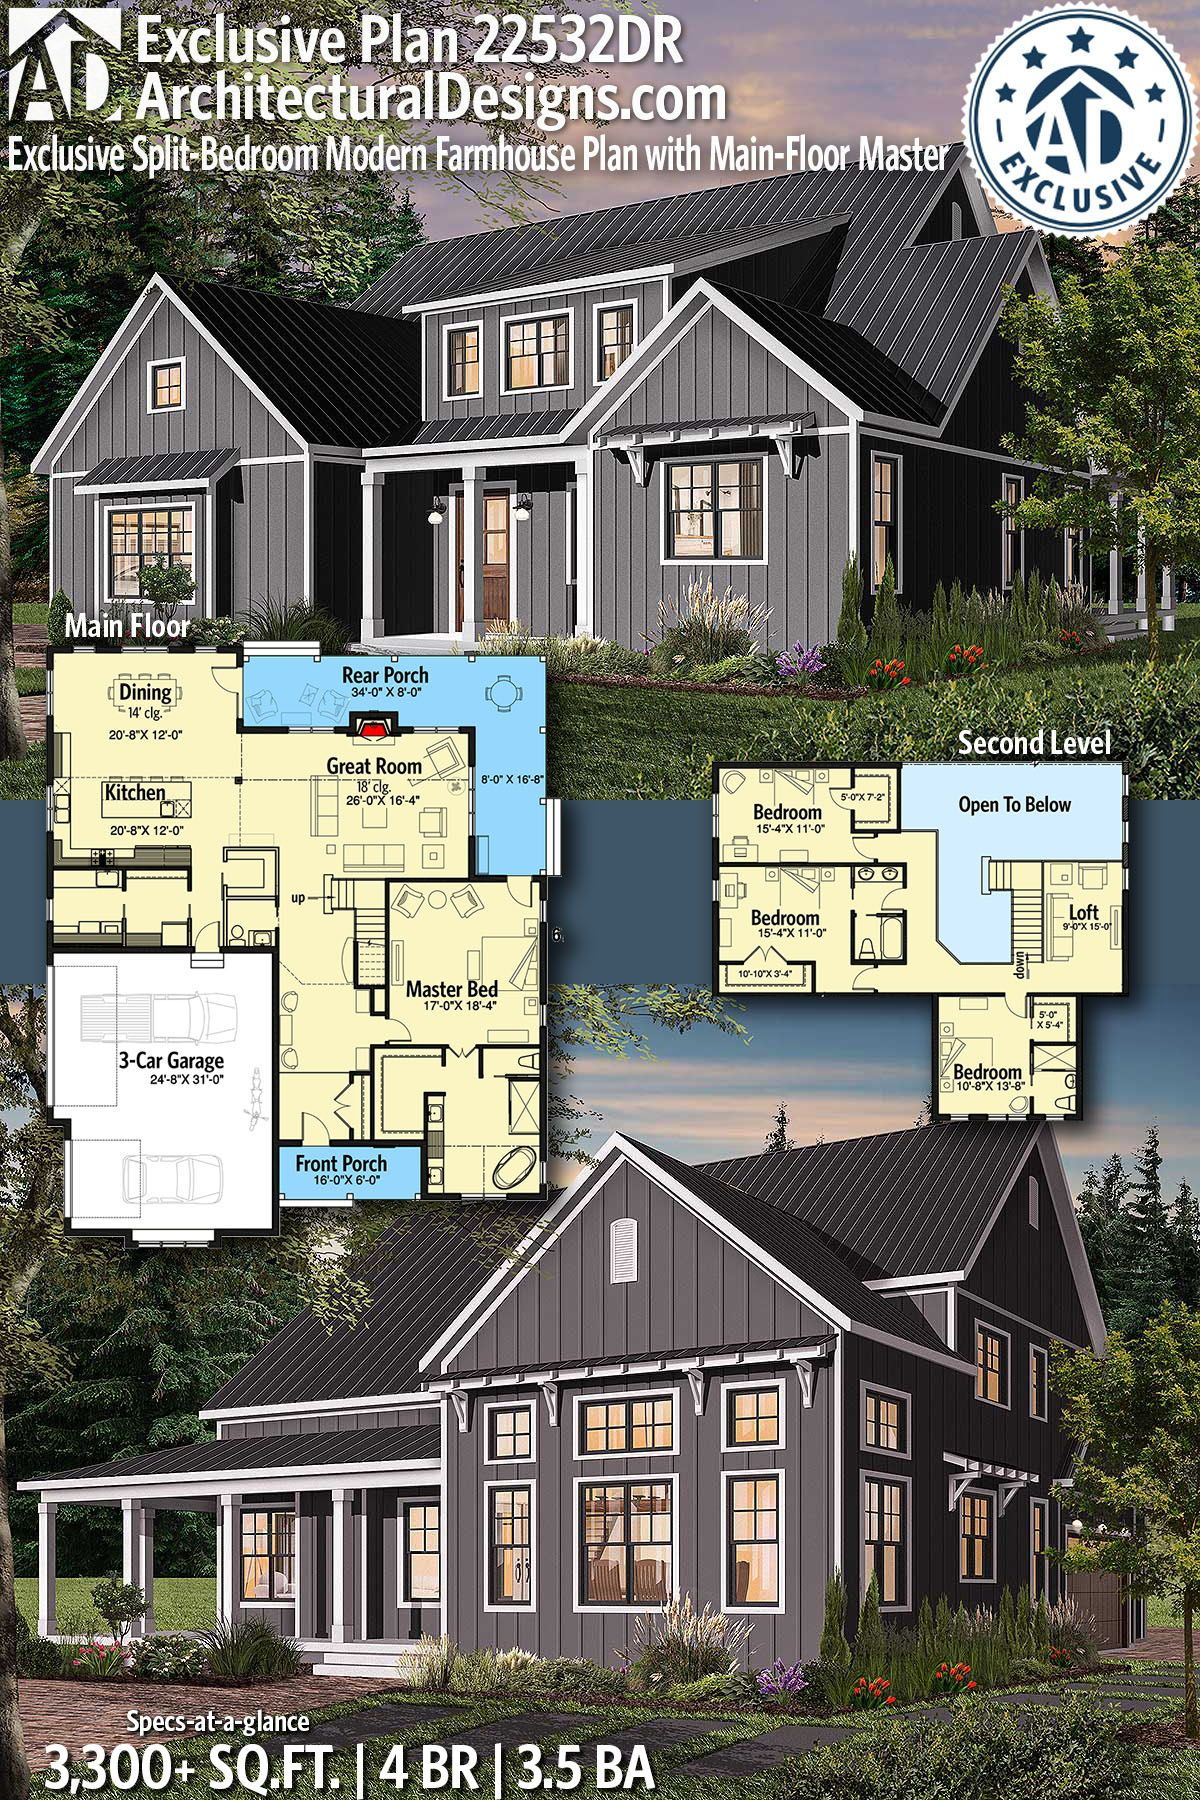 Architectural Designs Exclusive Farmhouse Plan 22532DR gives